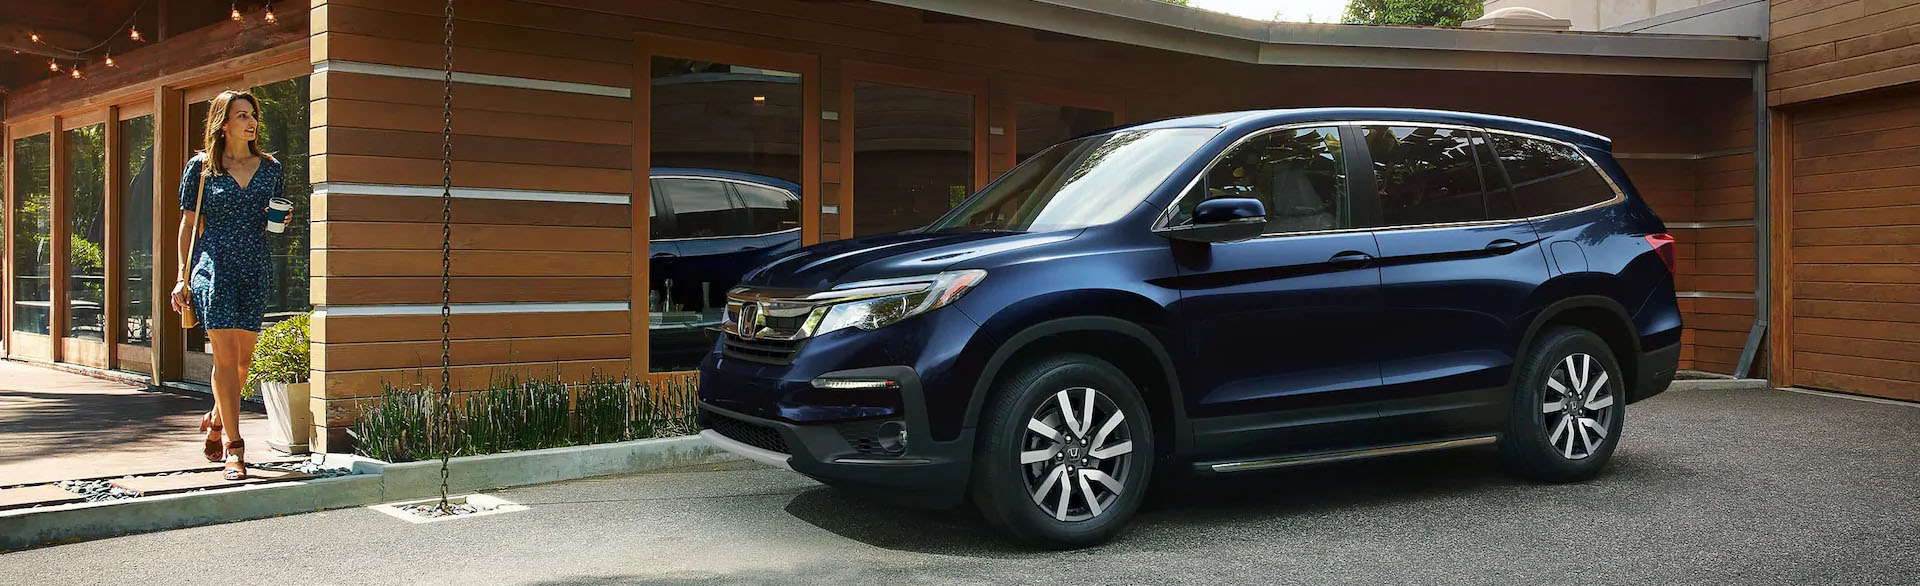 Honda Dealership Serving Rockaway, New Jersey